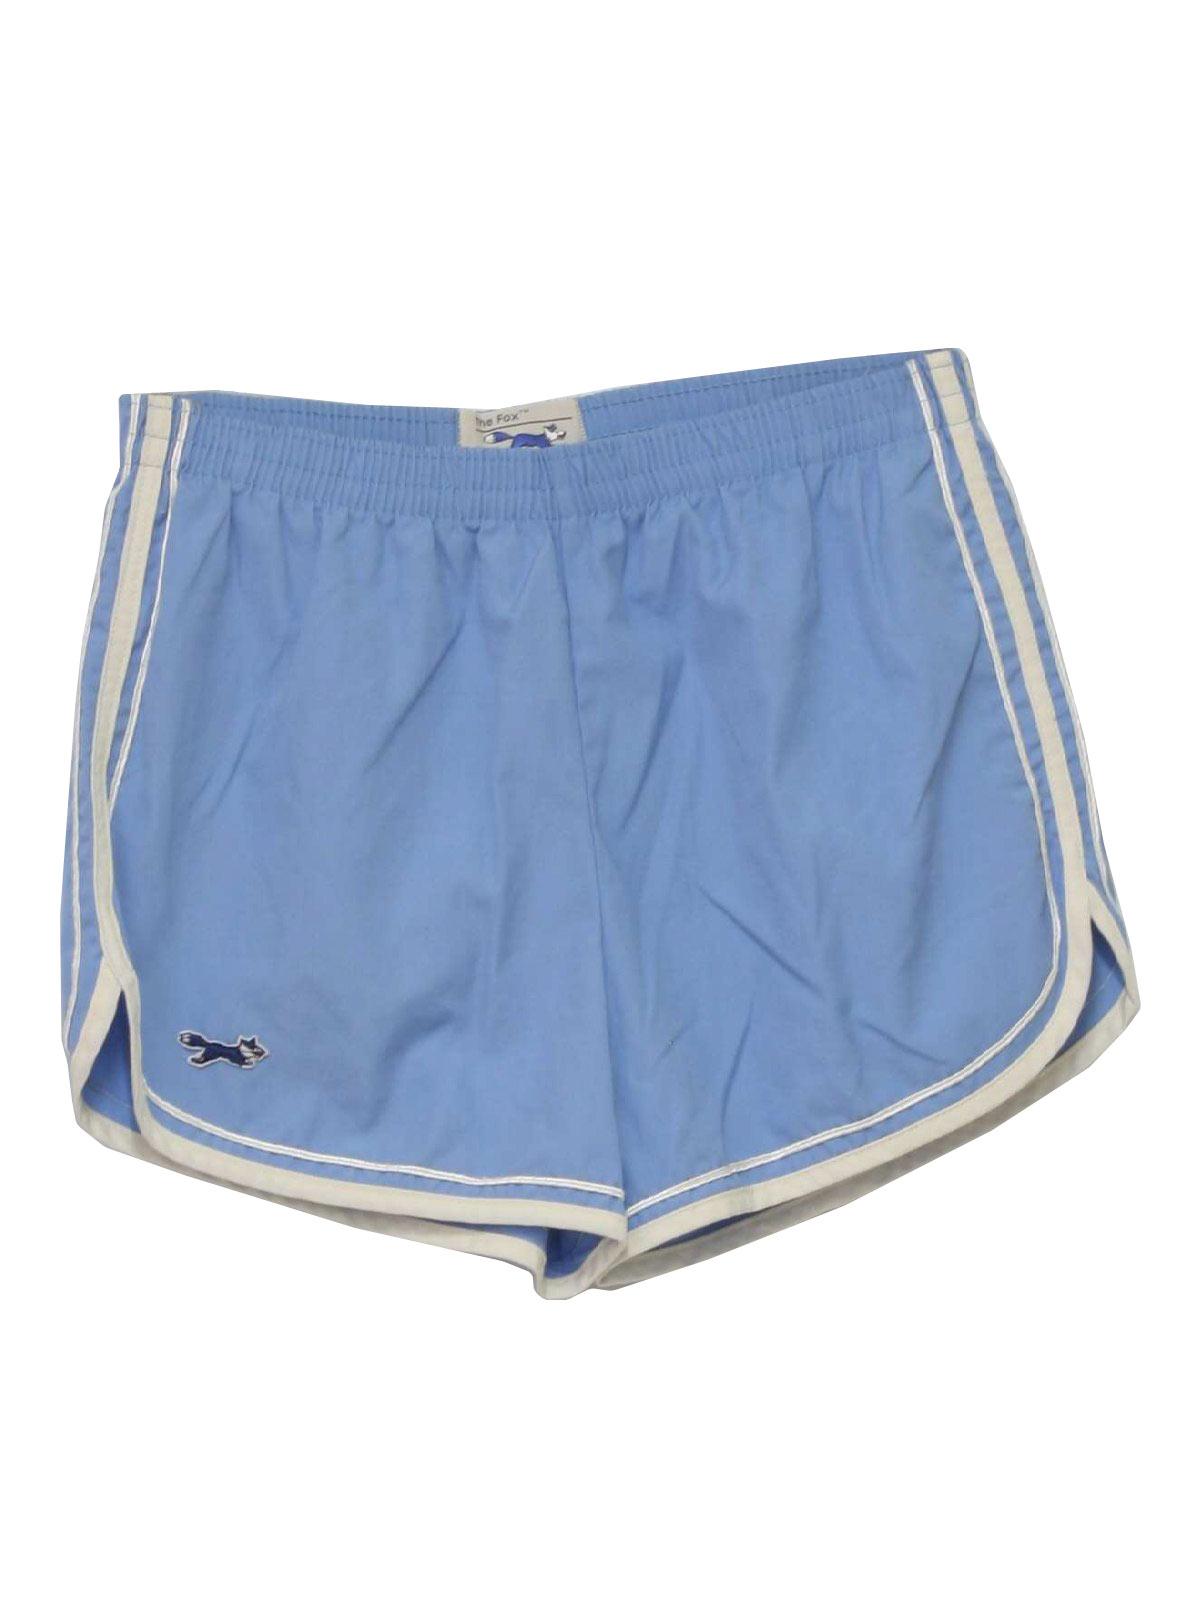 9025f6e66b 70's The Fox JCPenney Swimsuit/Swimwear: 70s -The Fox JCPenney- Mens ...